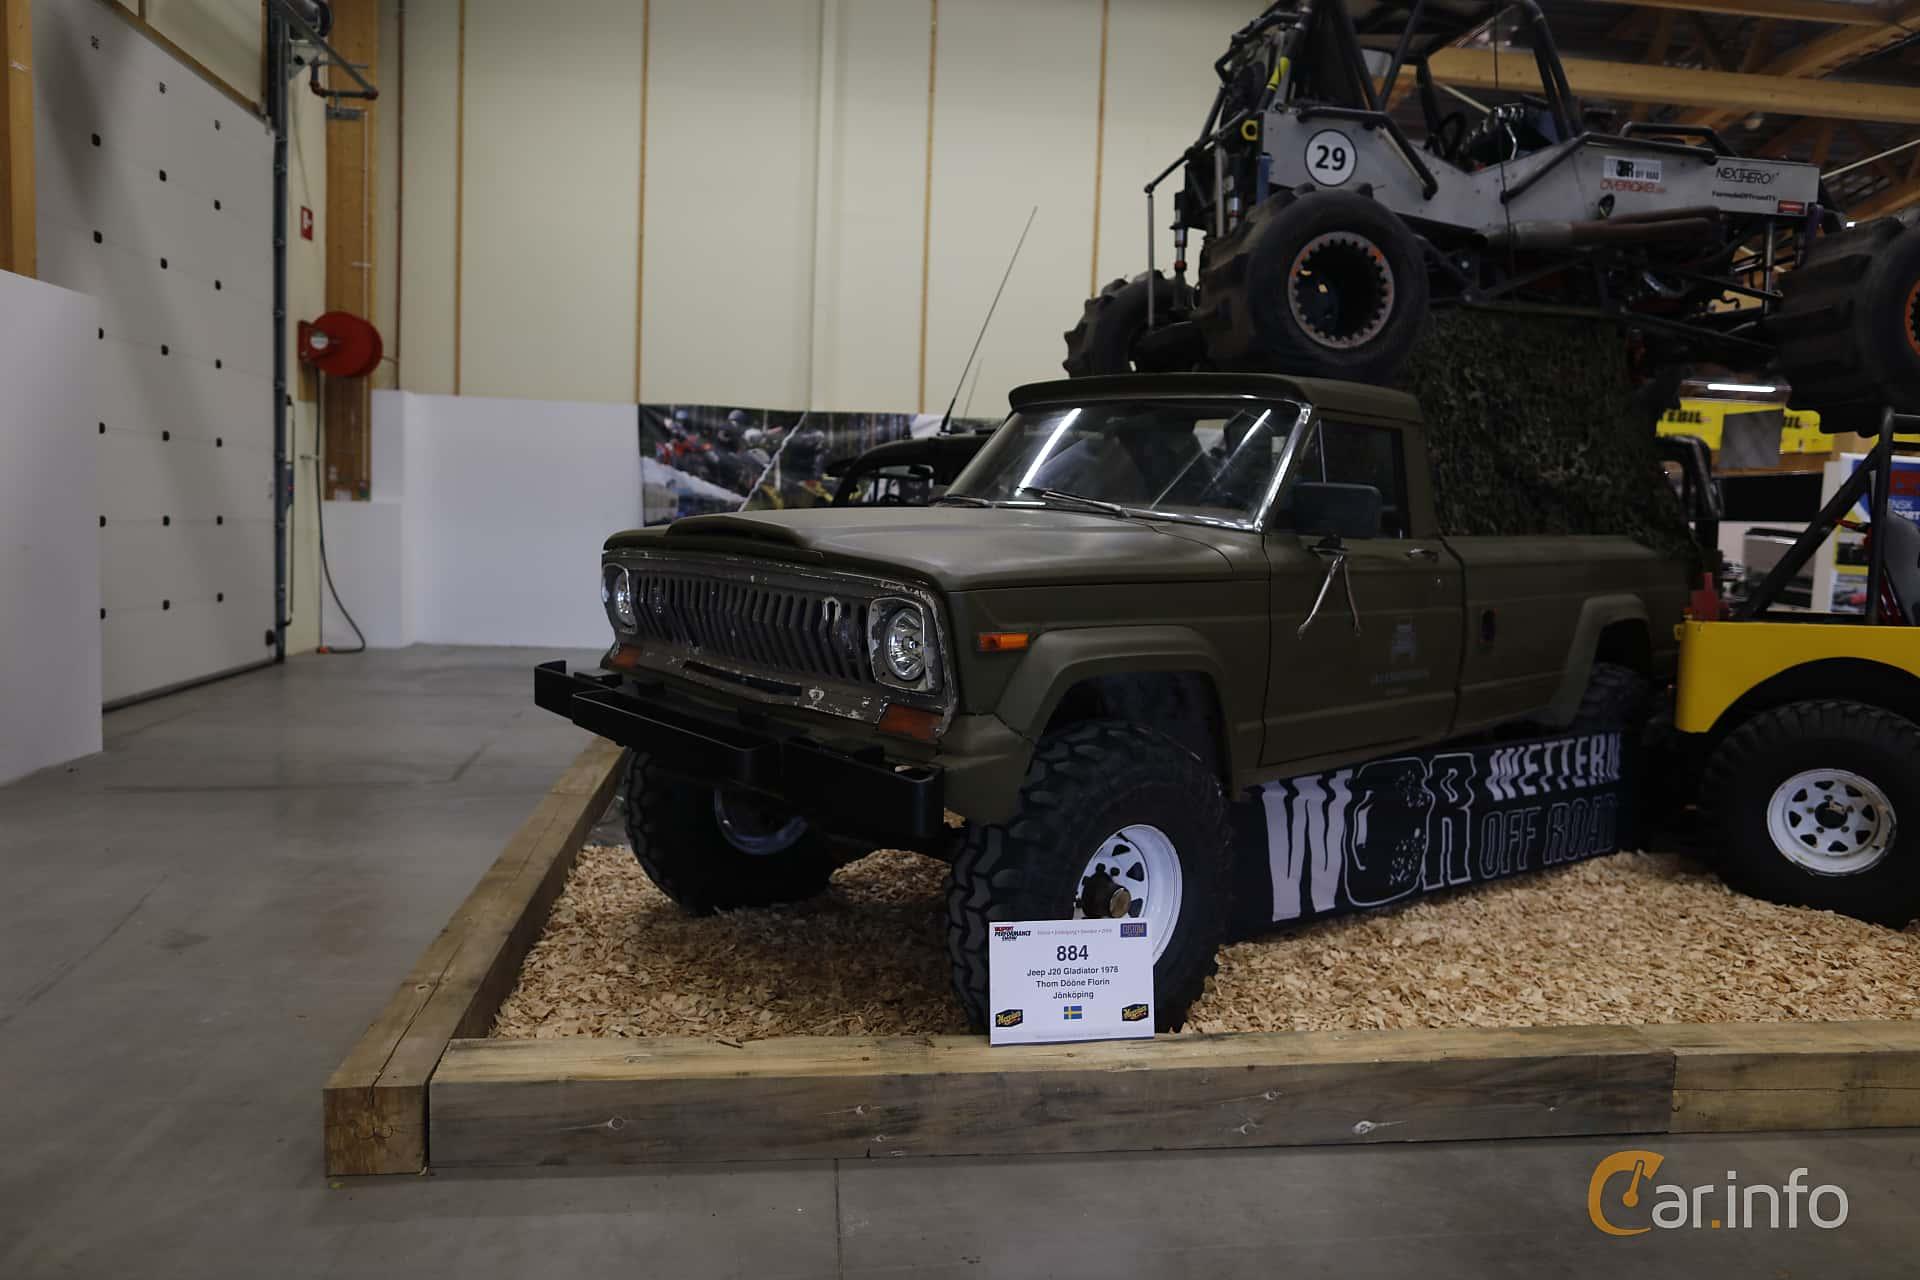 3 images of Jeep J20 1978 by jonasbonde